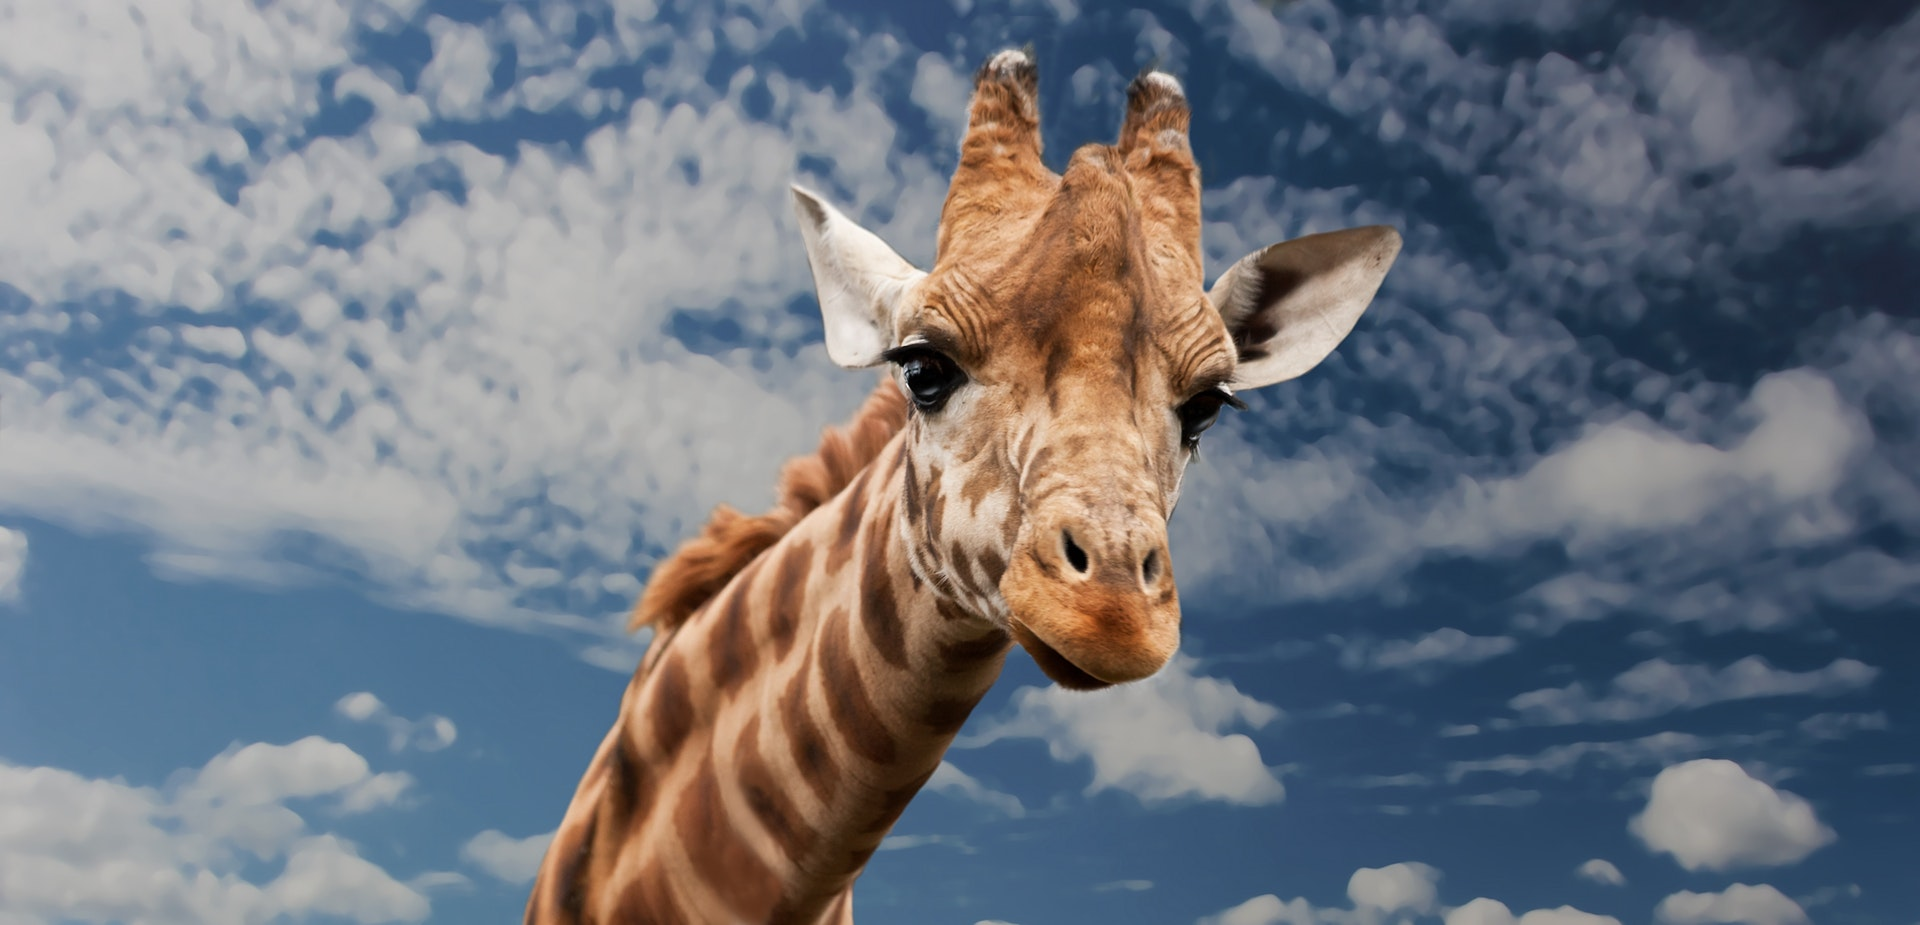 giraffe-animal-funny-facial-expression-39504.jpeg